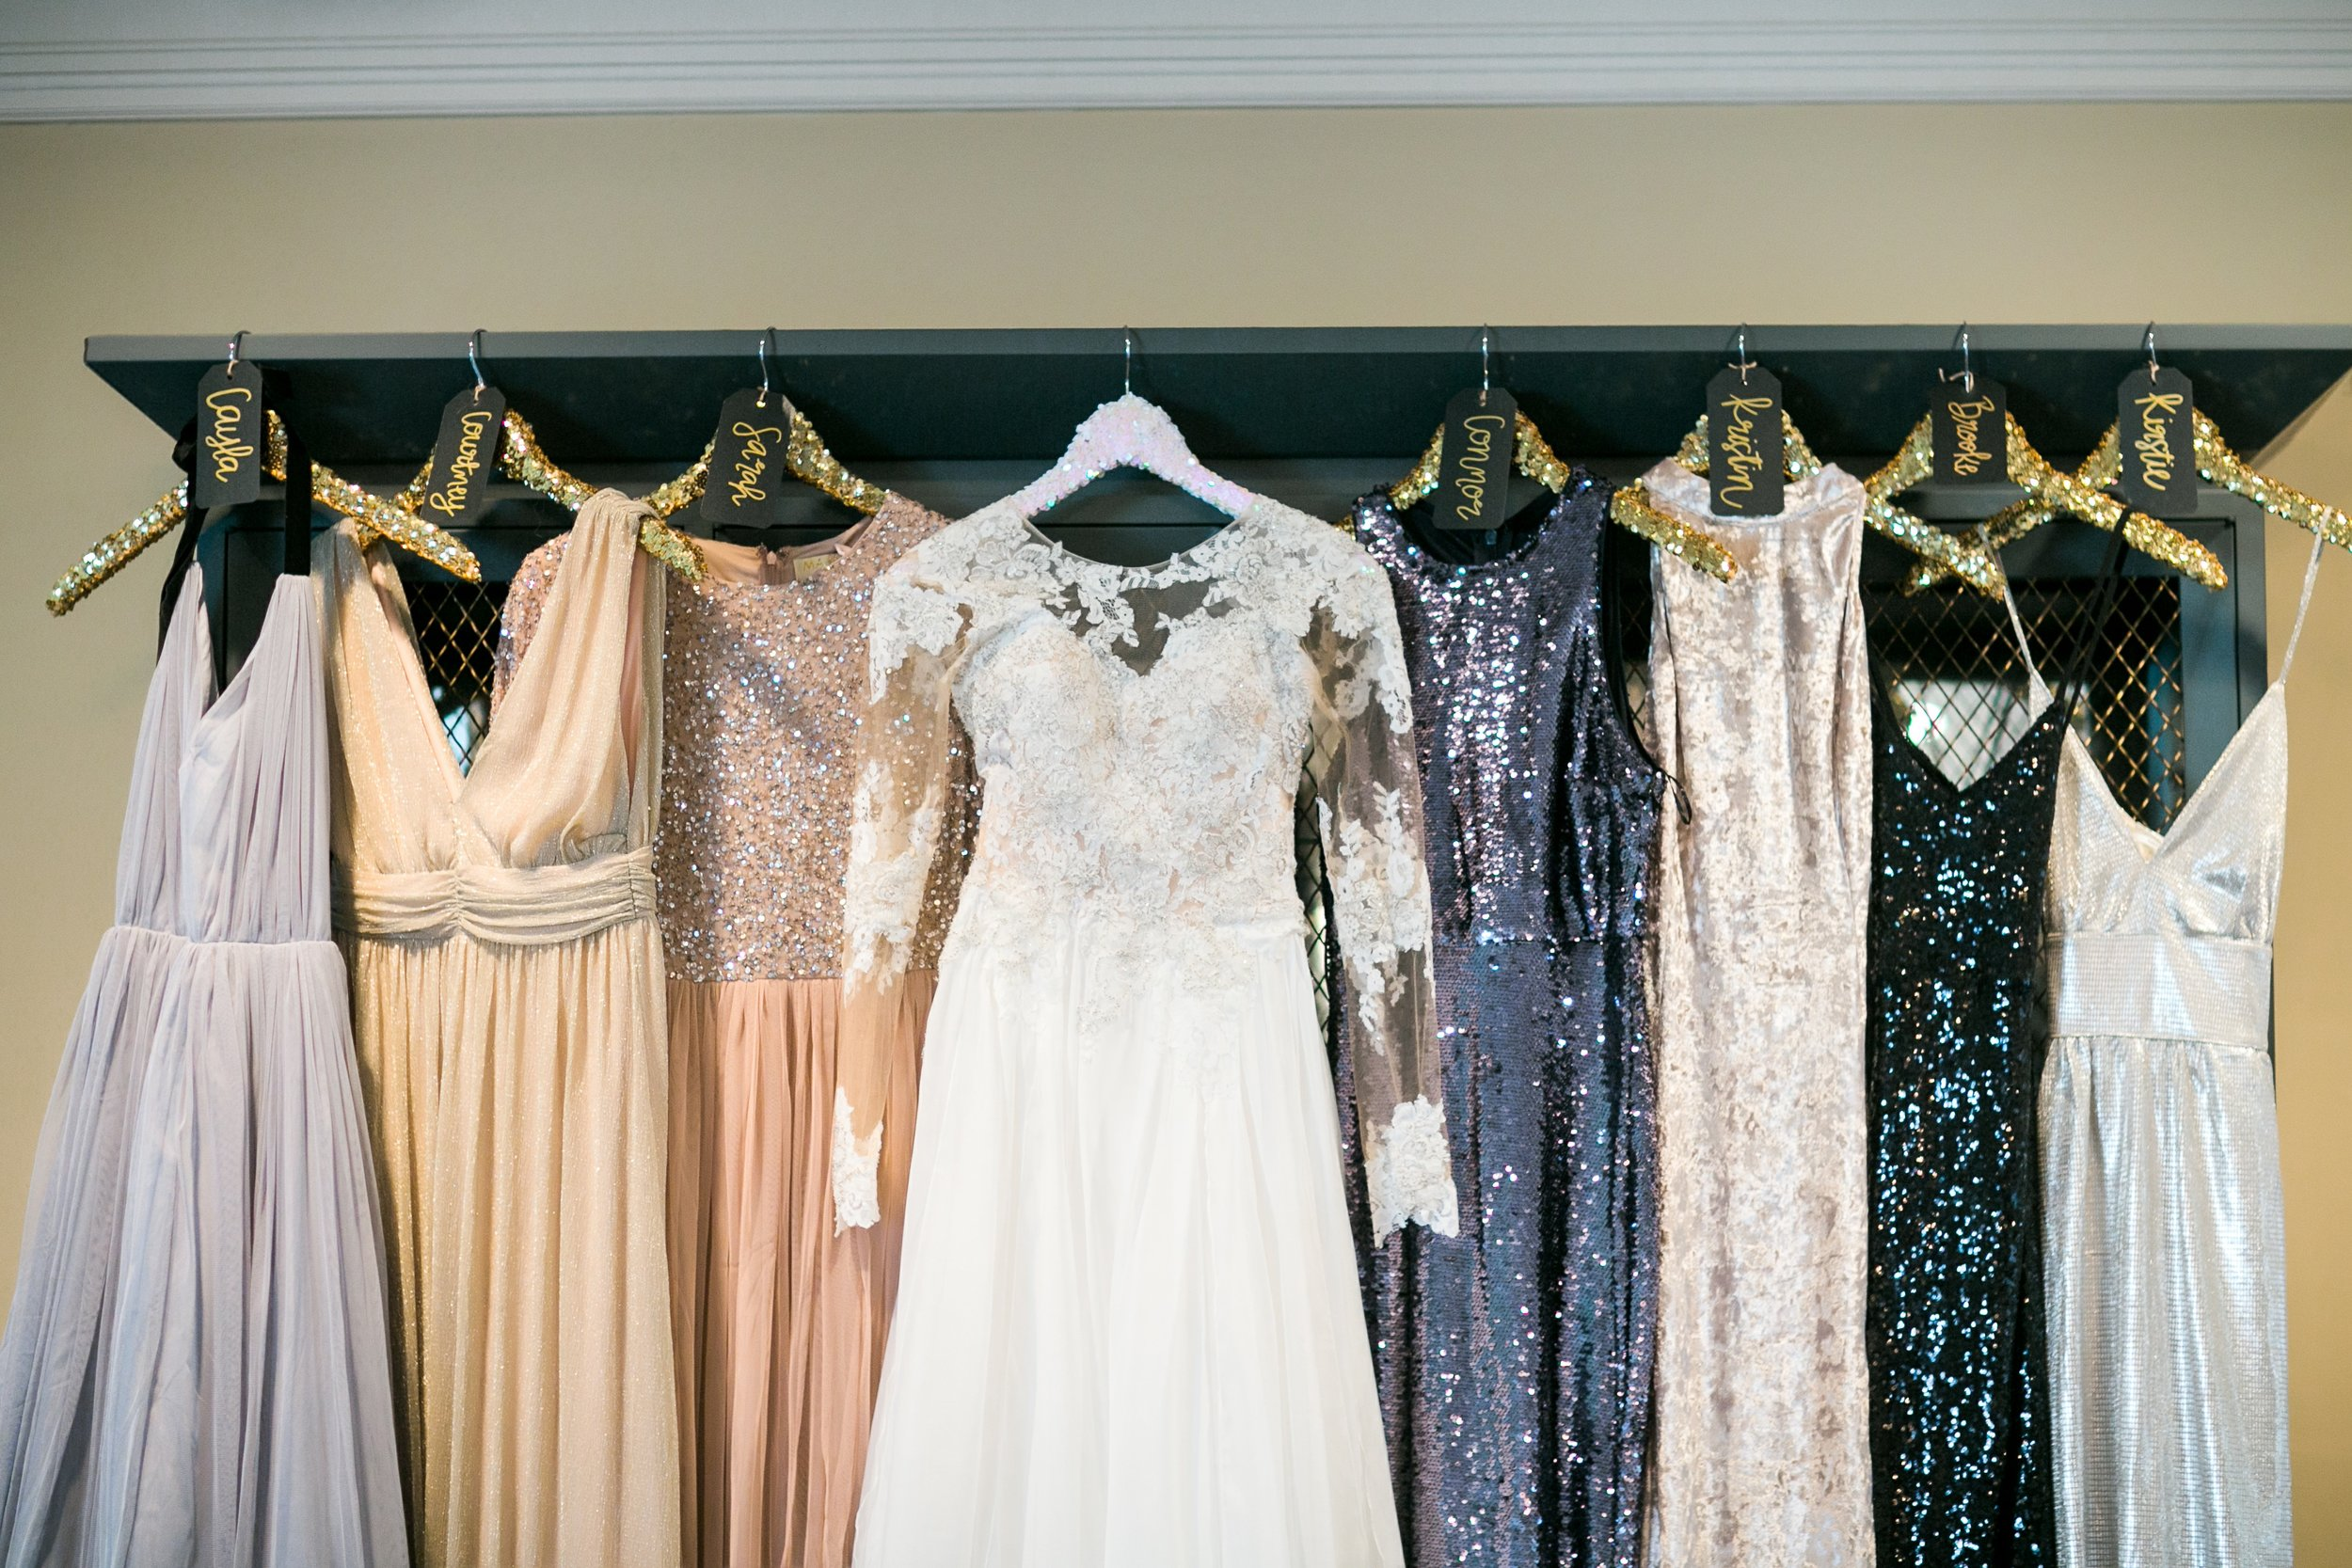 Roberson-Wedding-The-Forum-Lauren-Pinson-Wedding-Photography-Wichita-Falls-Texas-001.jpg